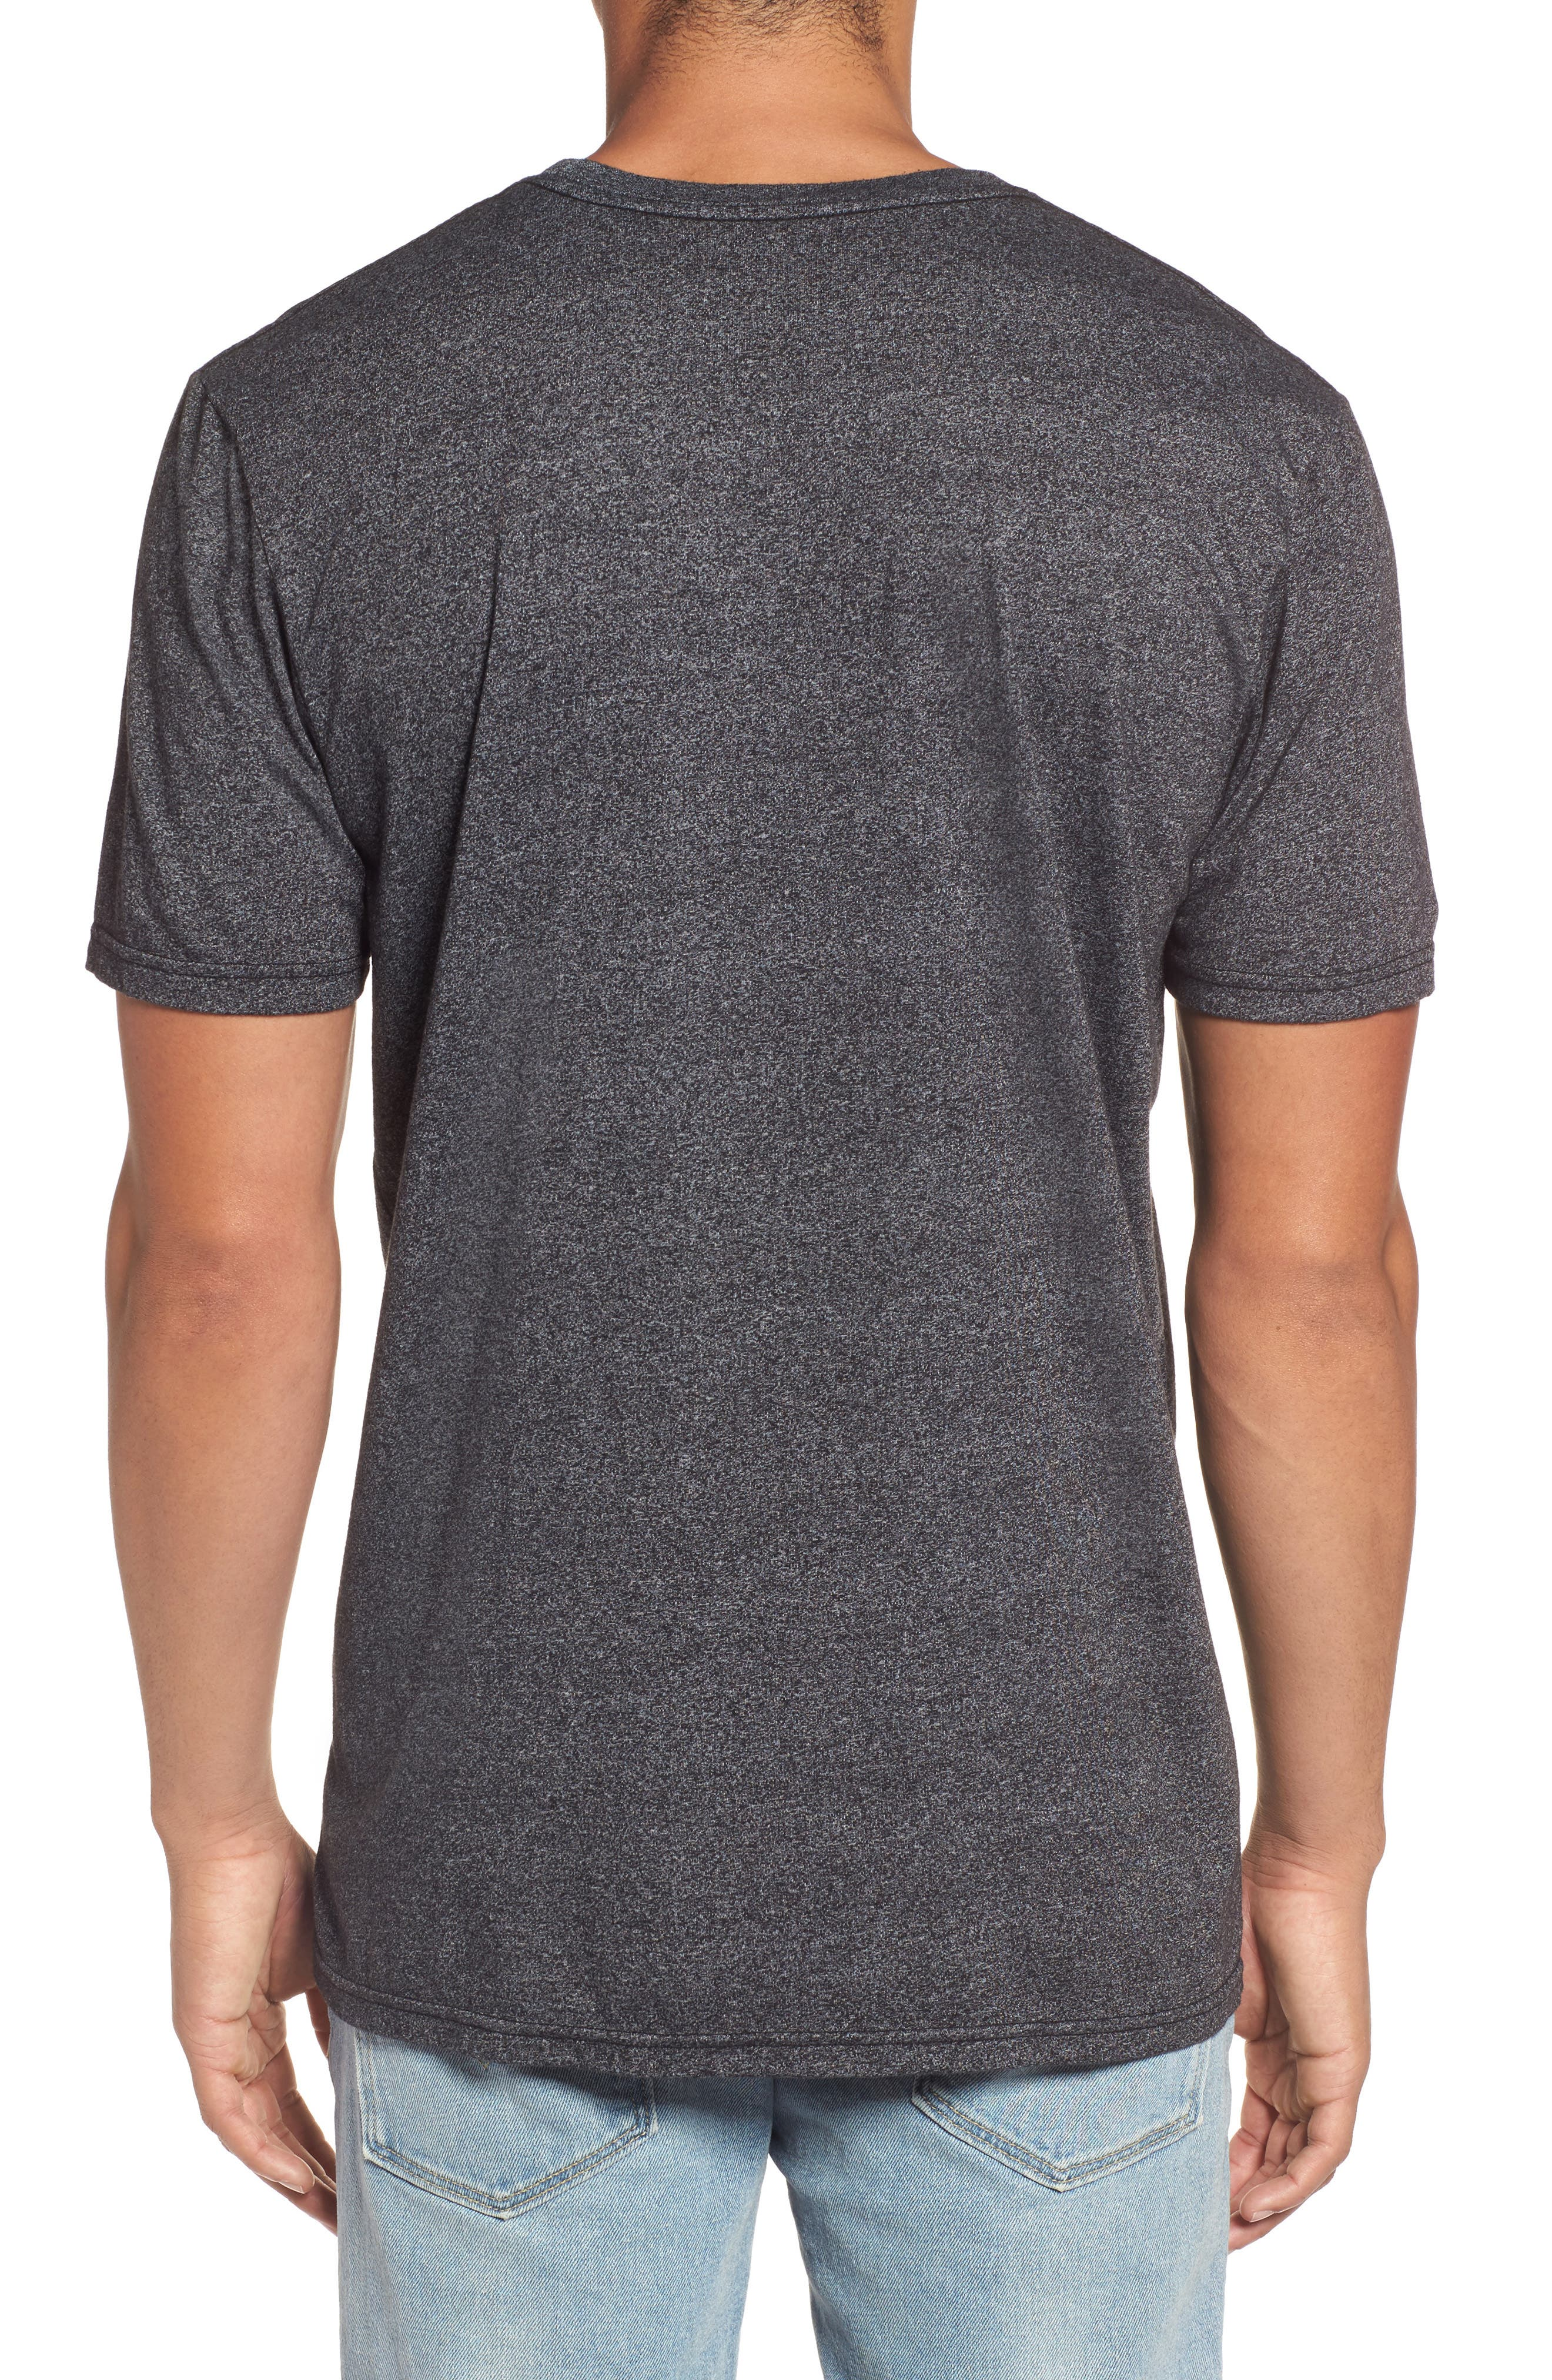 Bliss Mock Twist Graphic T-Shirt,                             Alternate thumbnail 2, color,                             001